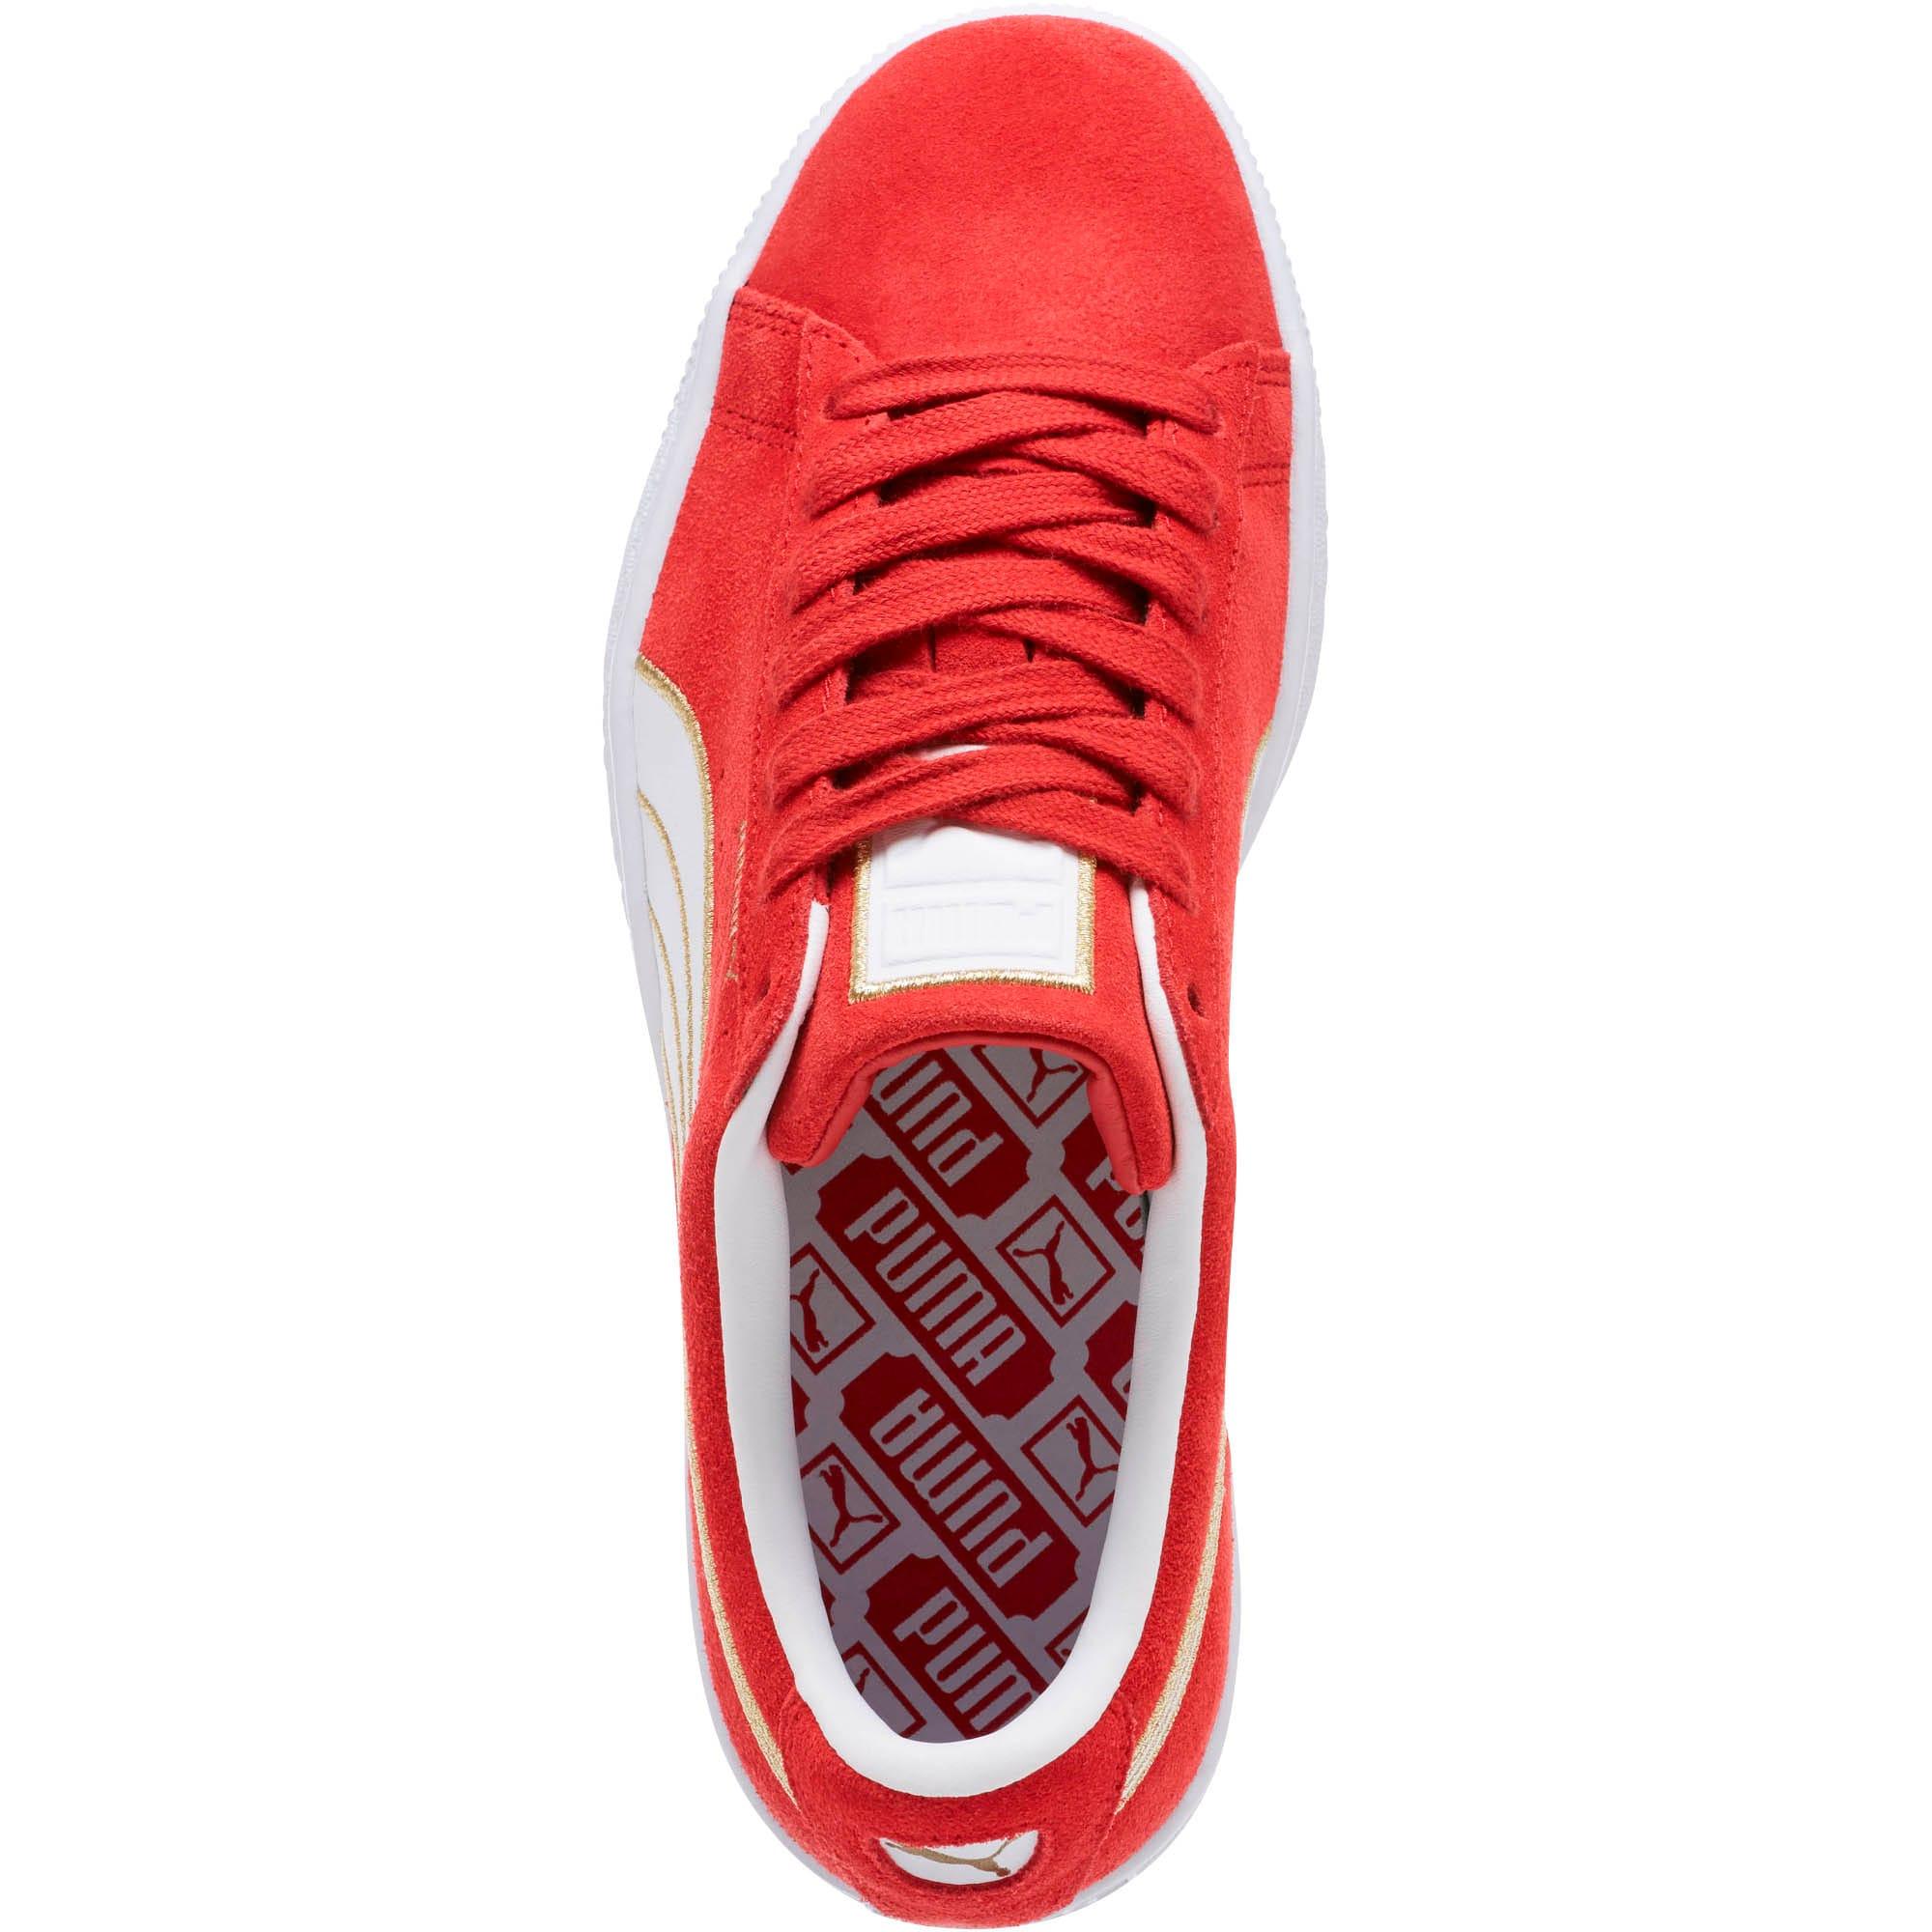 Thumbnail 5 of Suede Varsity Women's Sneakers, Ribbon Red-Puma White, medium